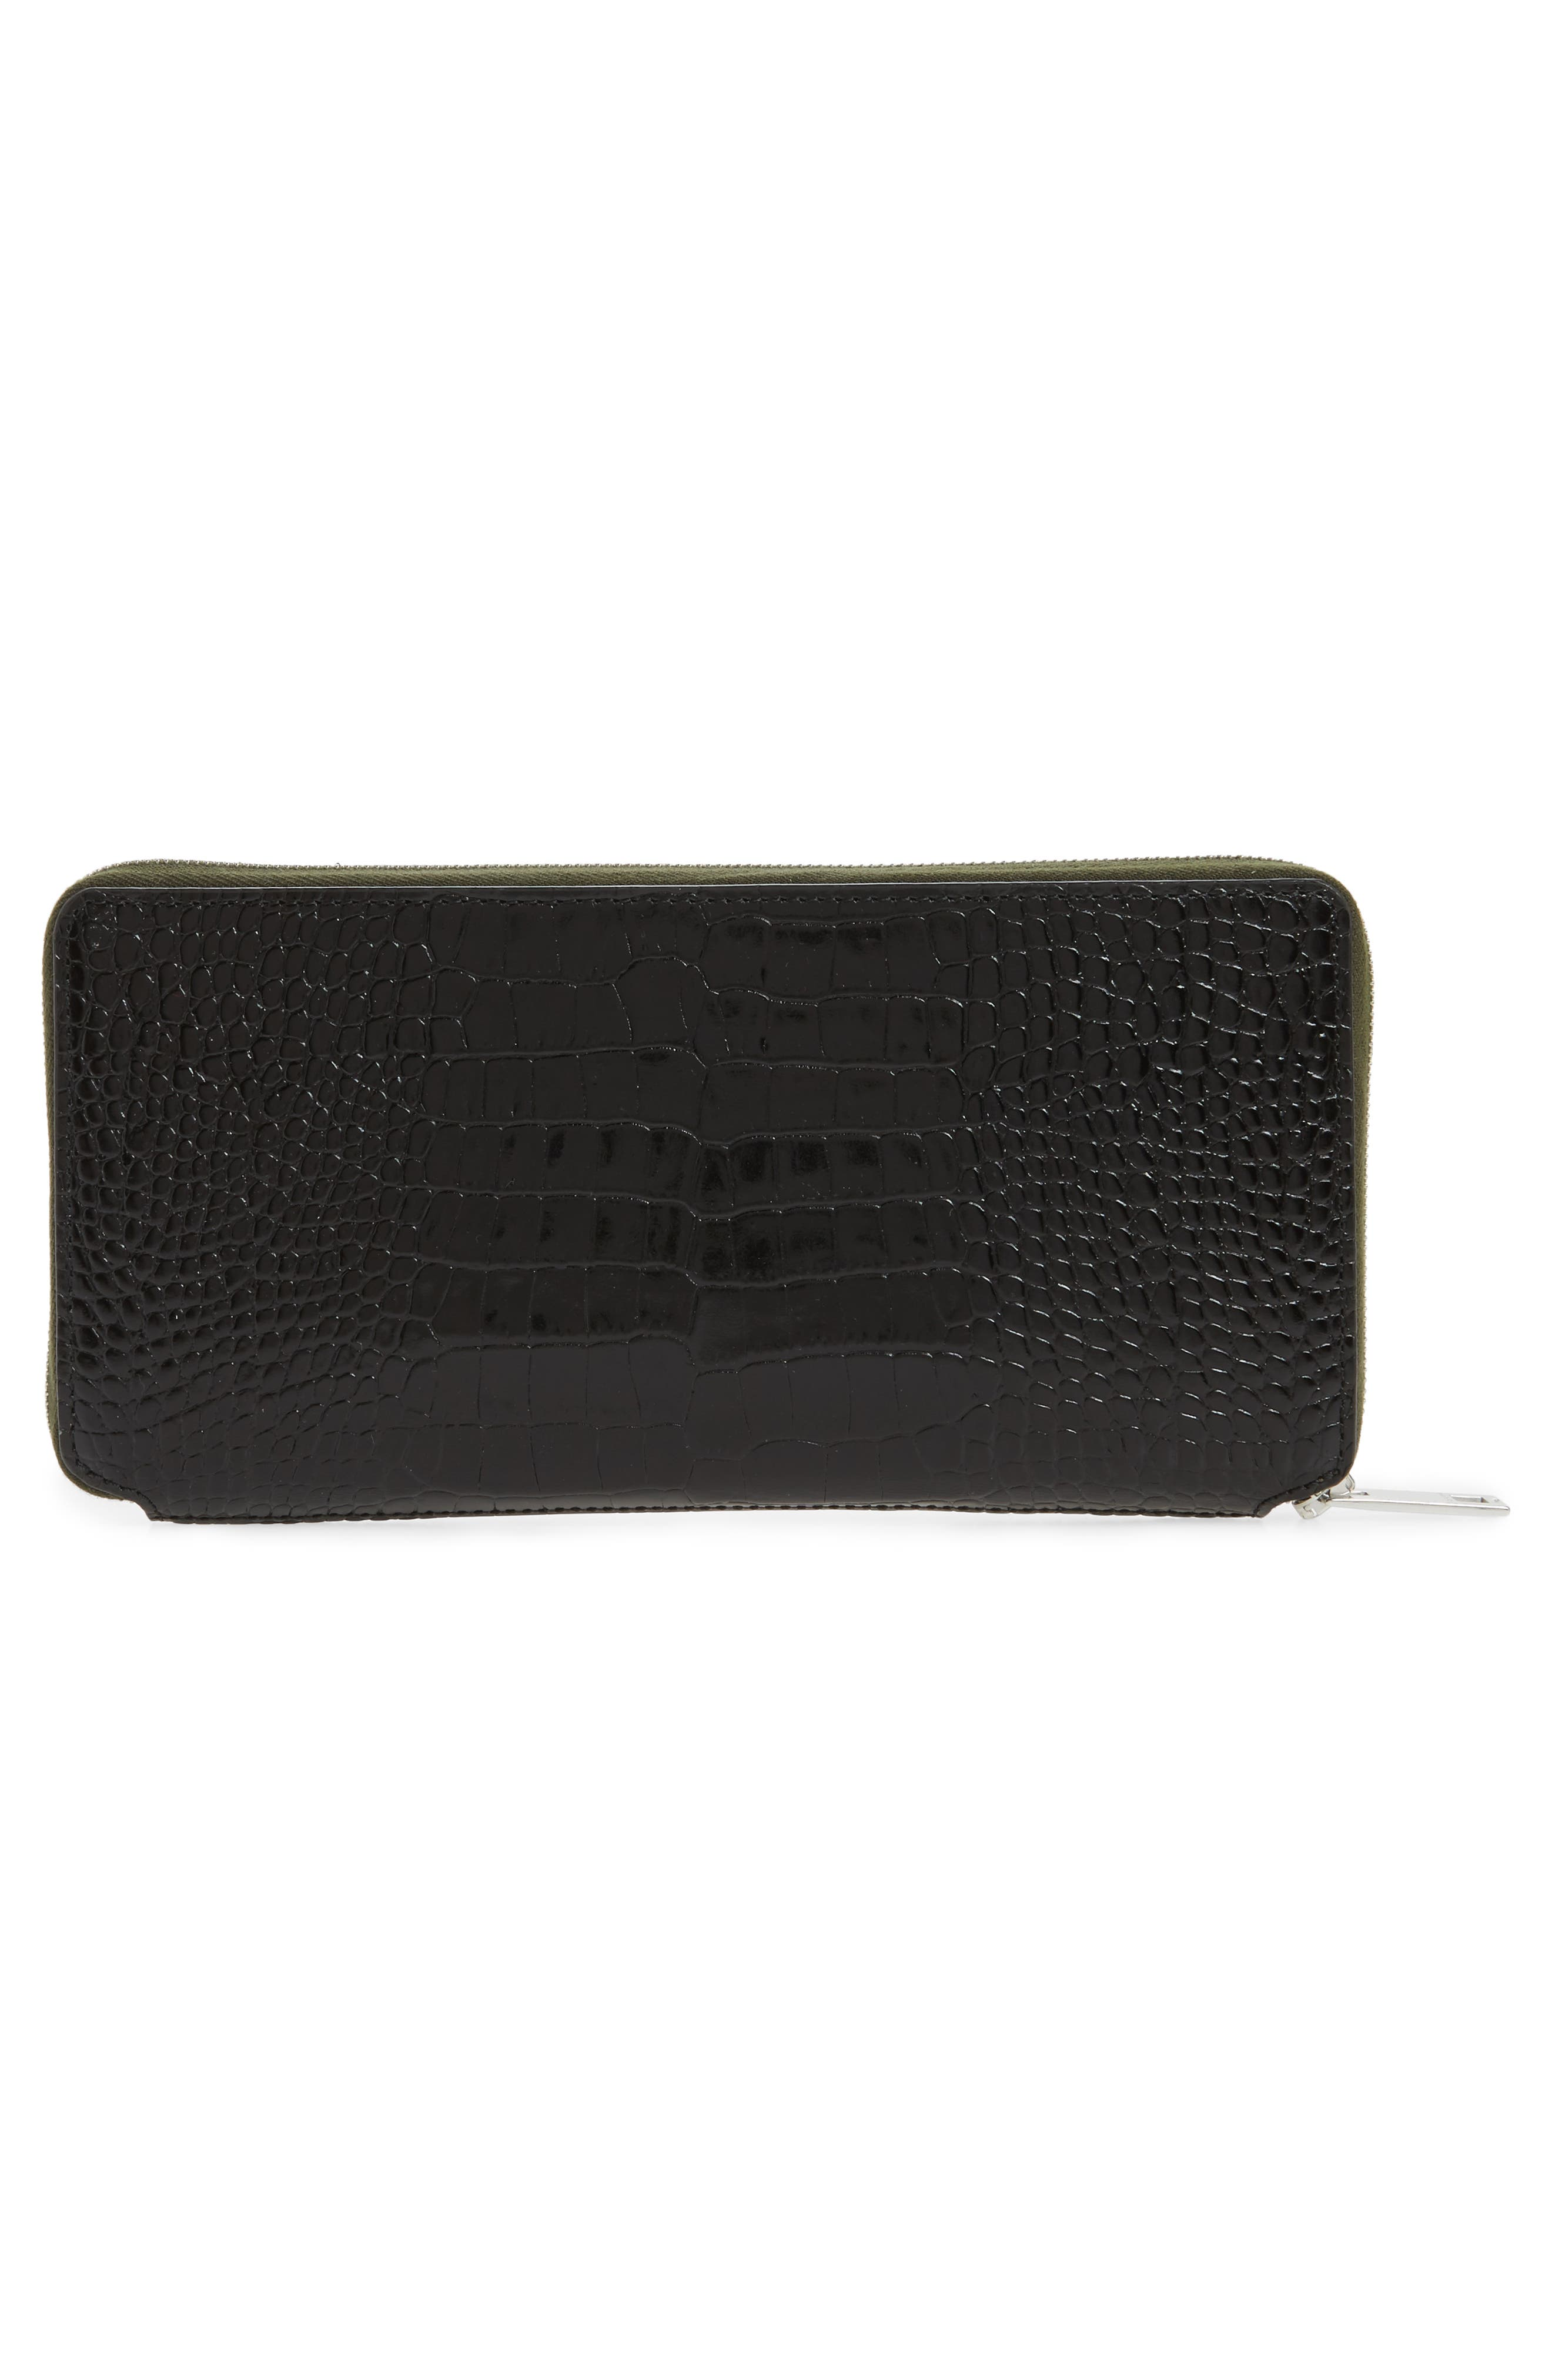 Croc Embossed Zip Around Leather Wallet,                             Alternate thumbnail 4, color,                             Black Croco